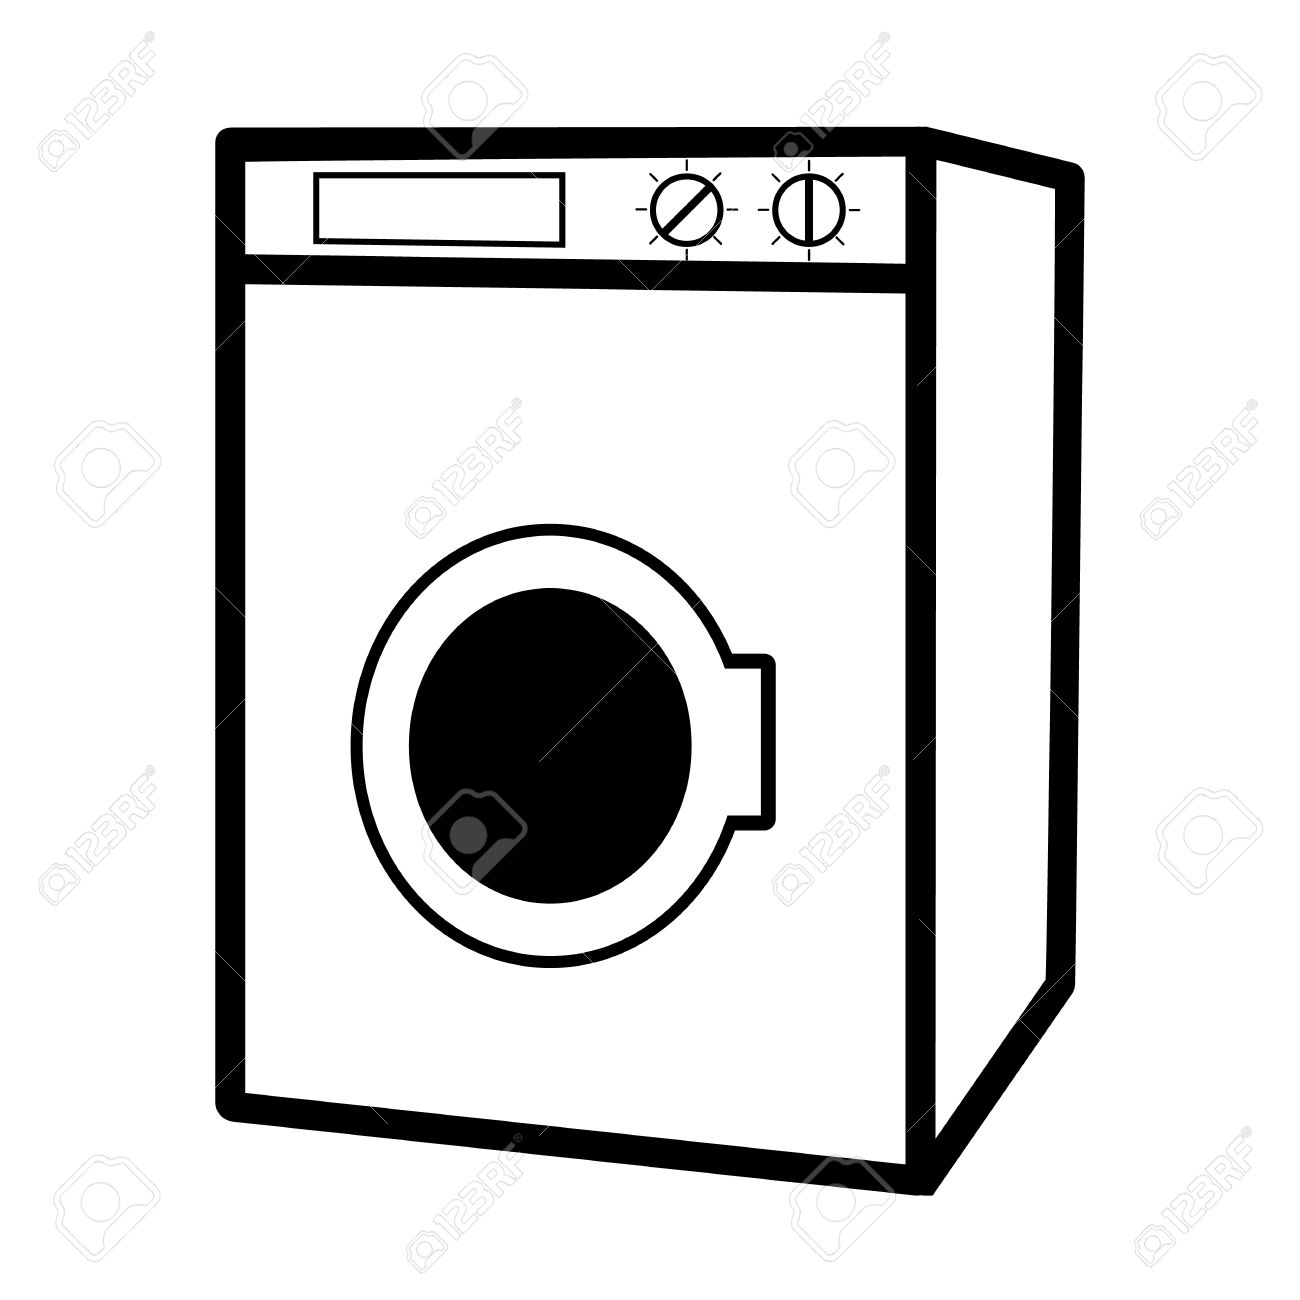 Washing machine clipart images image free stock Washing machine clipart images - ClipartFest image free stock